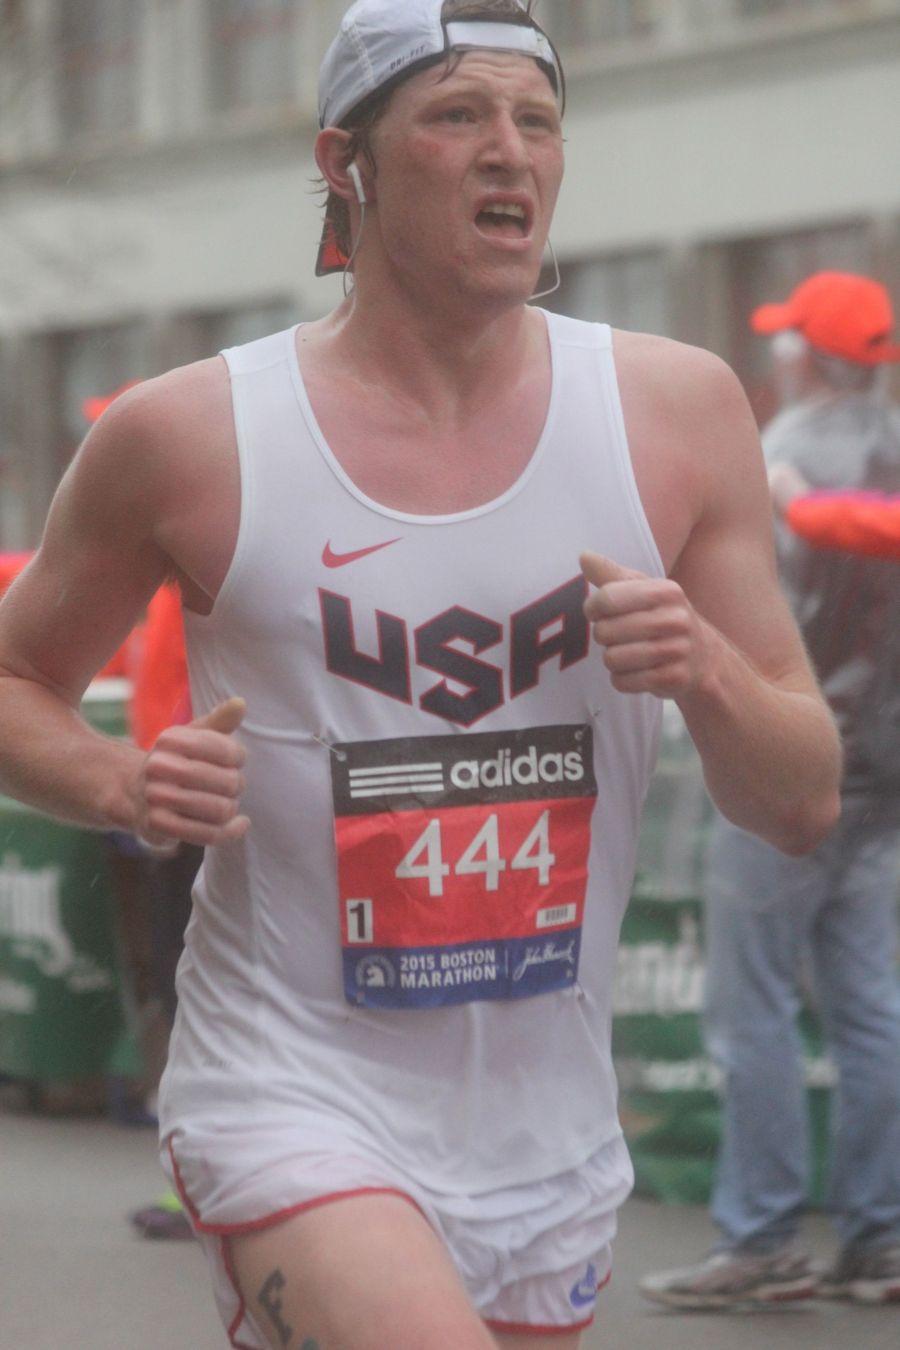 boston marathon april 20 2015 racer number 444